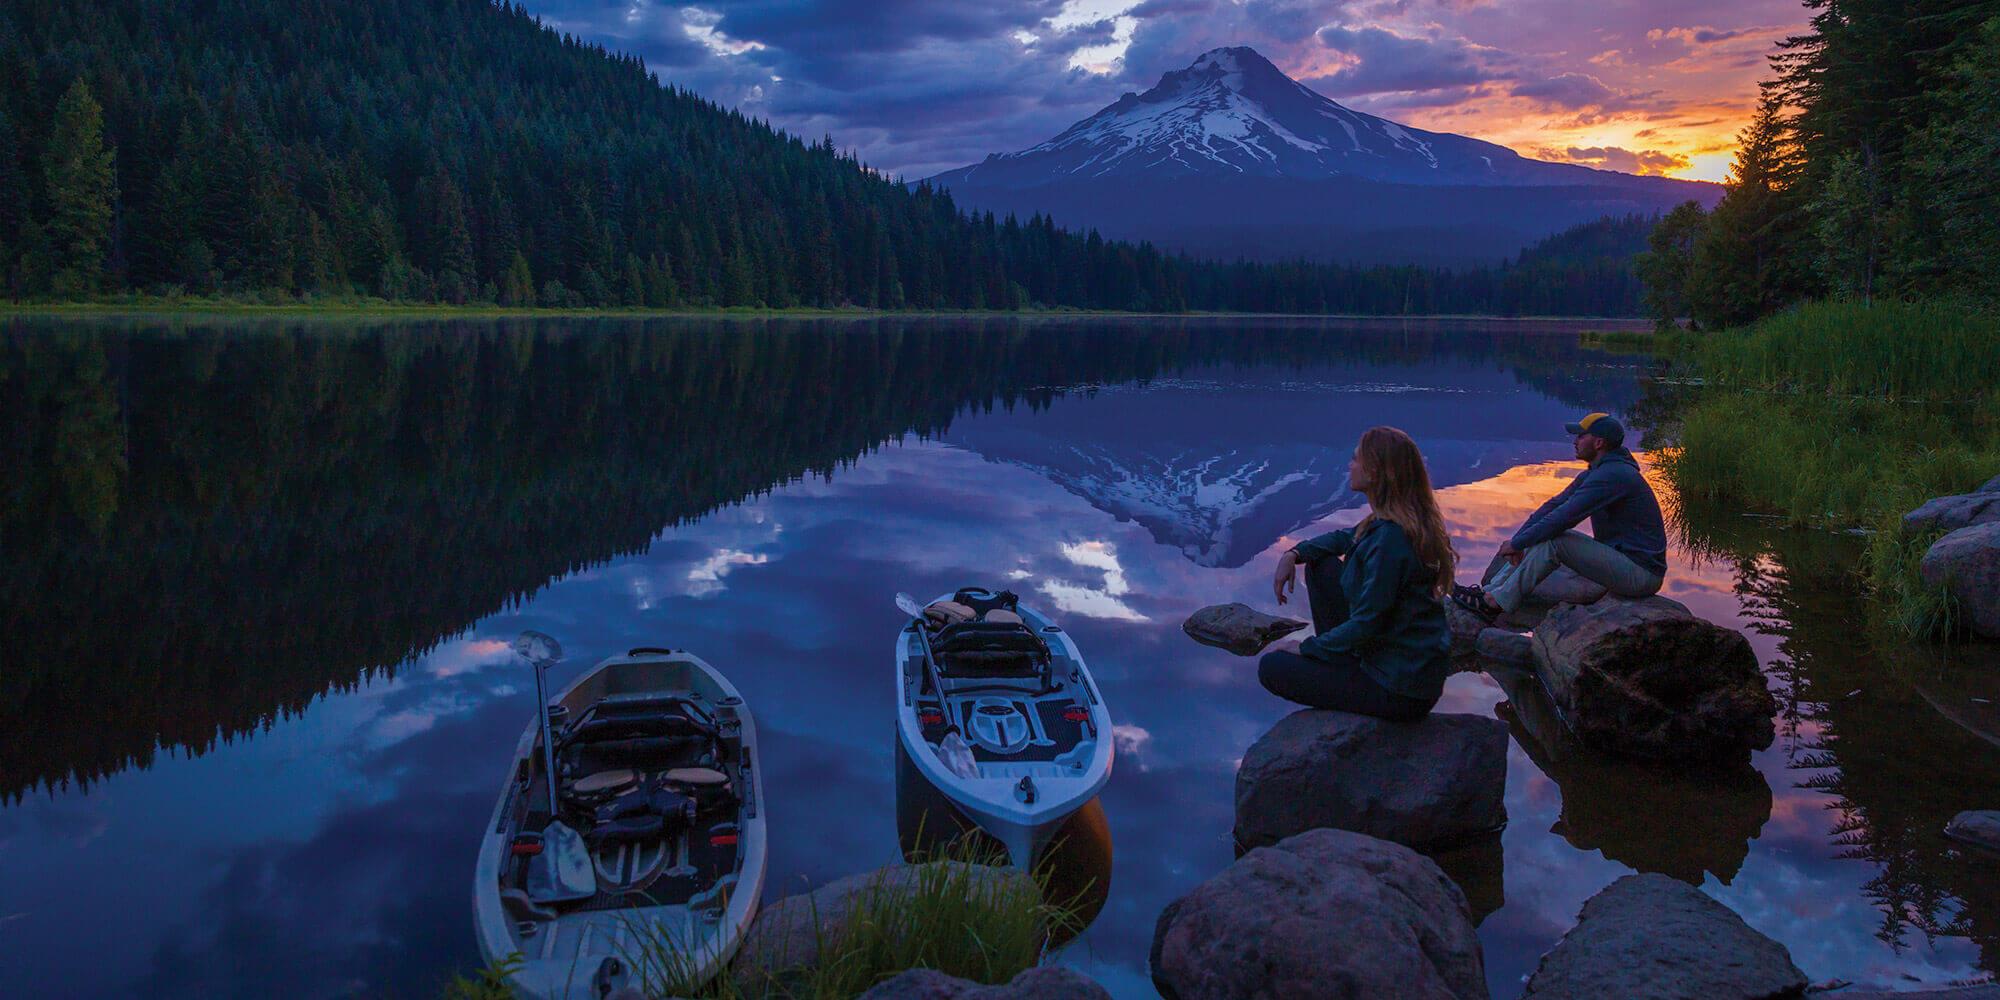 Ascend Kayaks